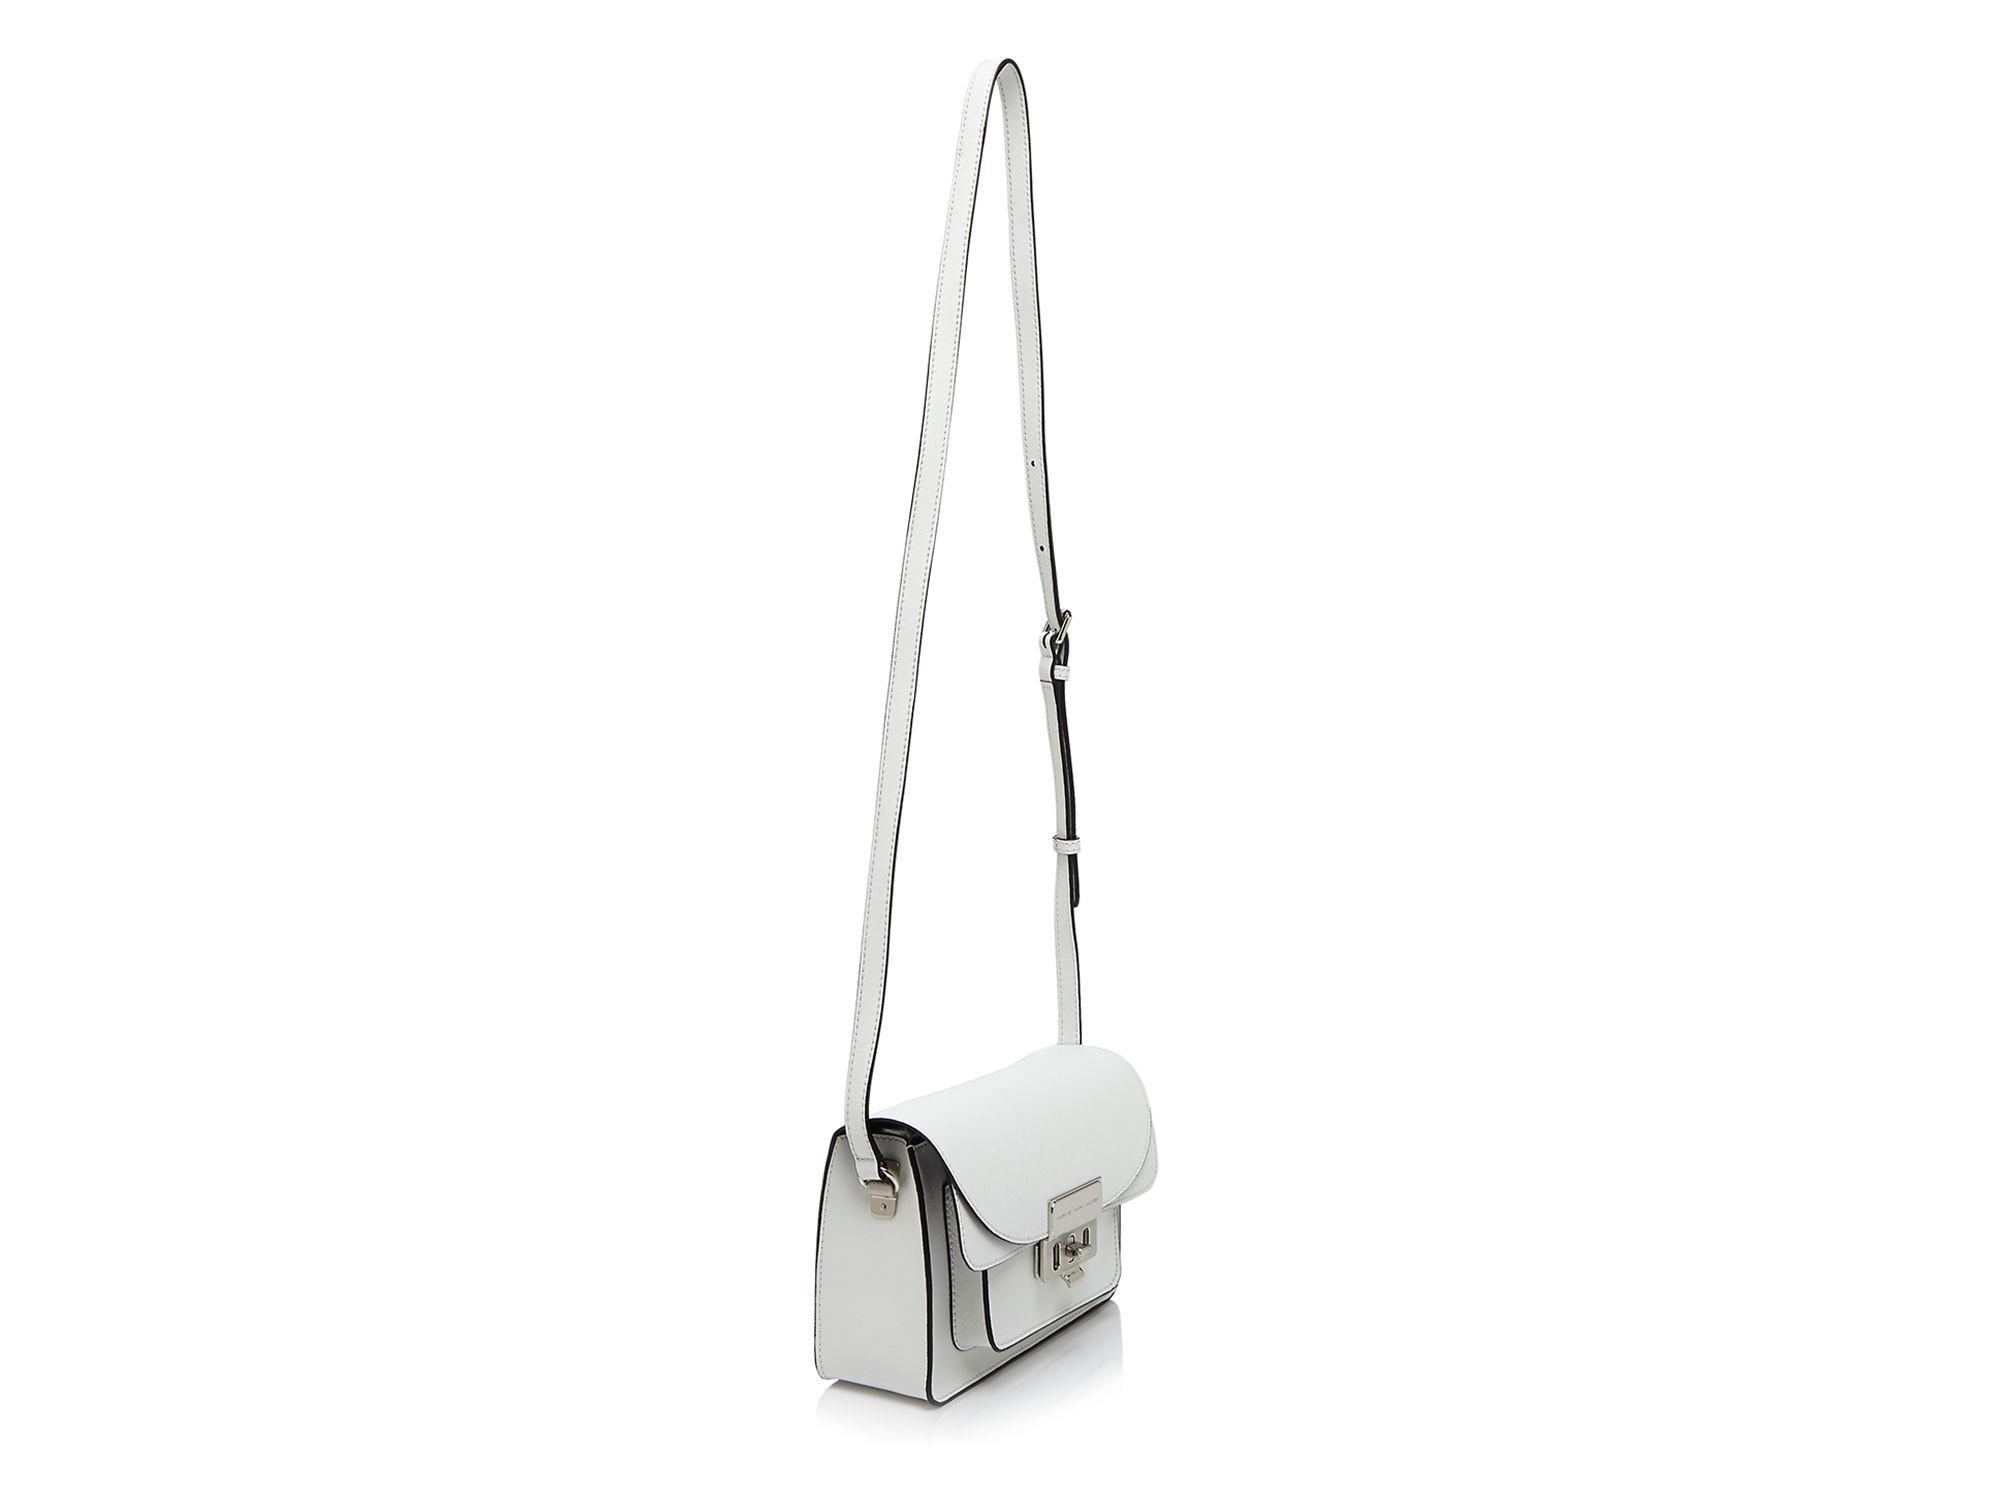 Marc By Marc Jacobs Crossbody - Lip Lock in White